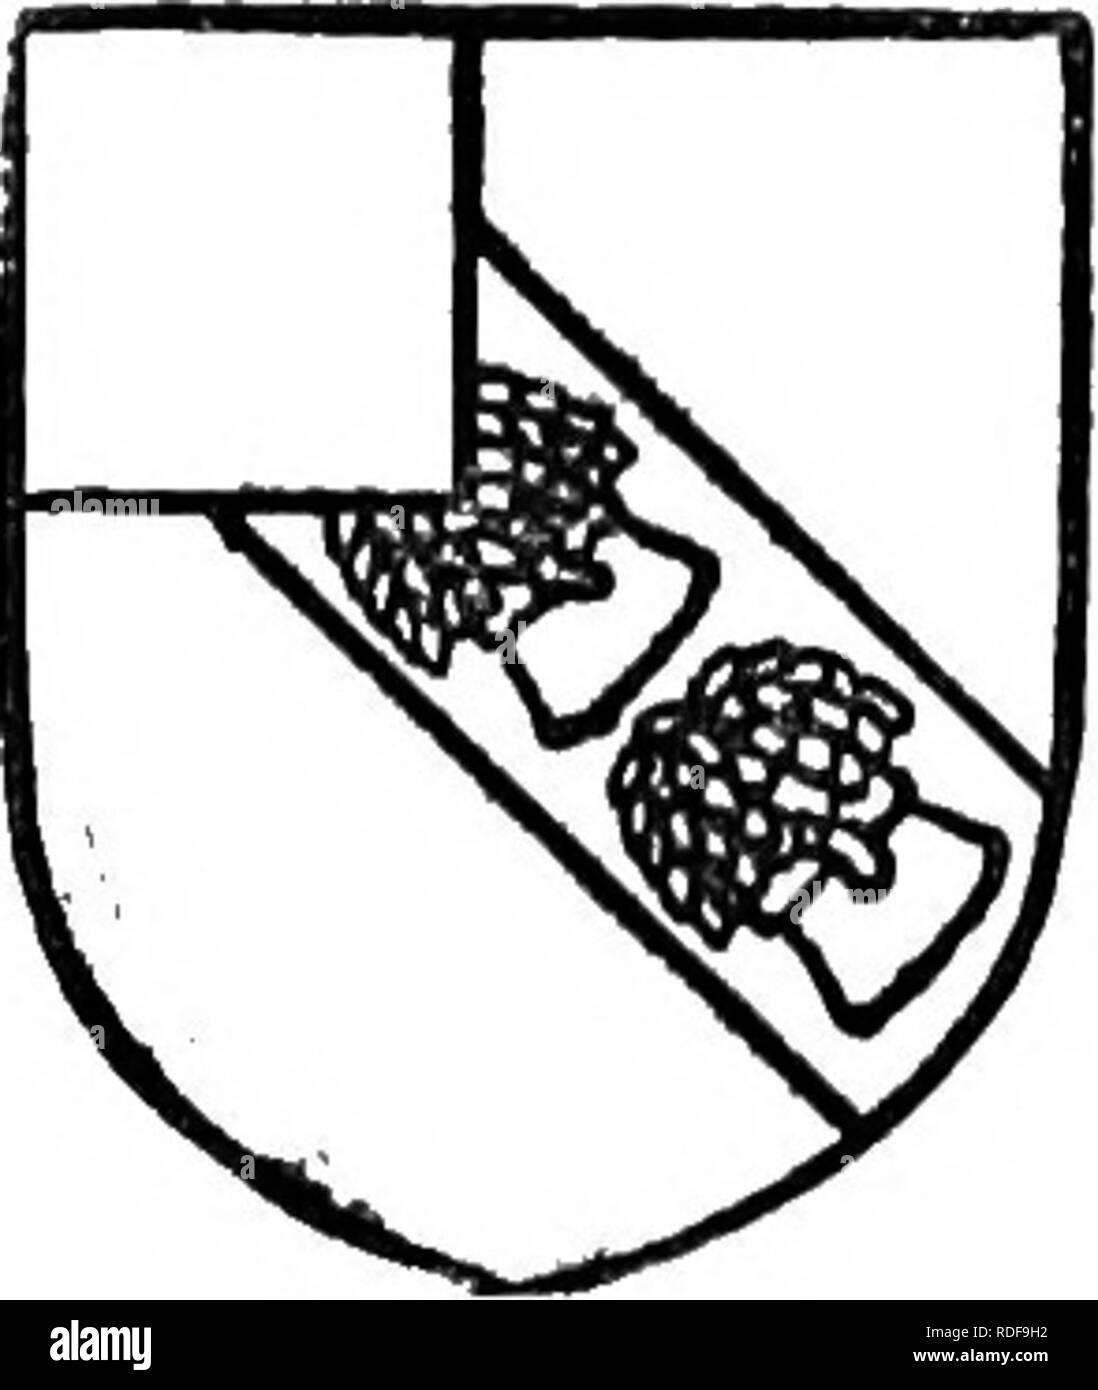 Vitesse datant tchécowice